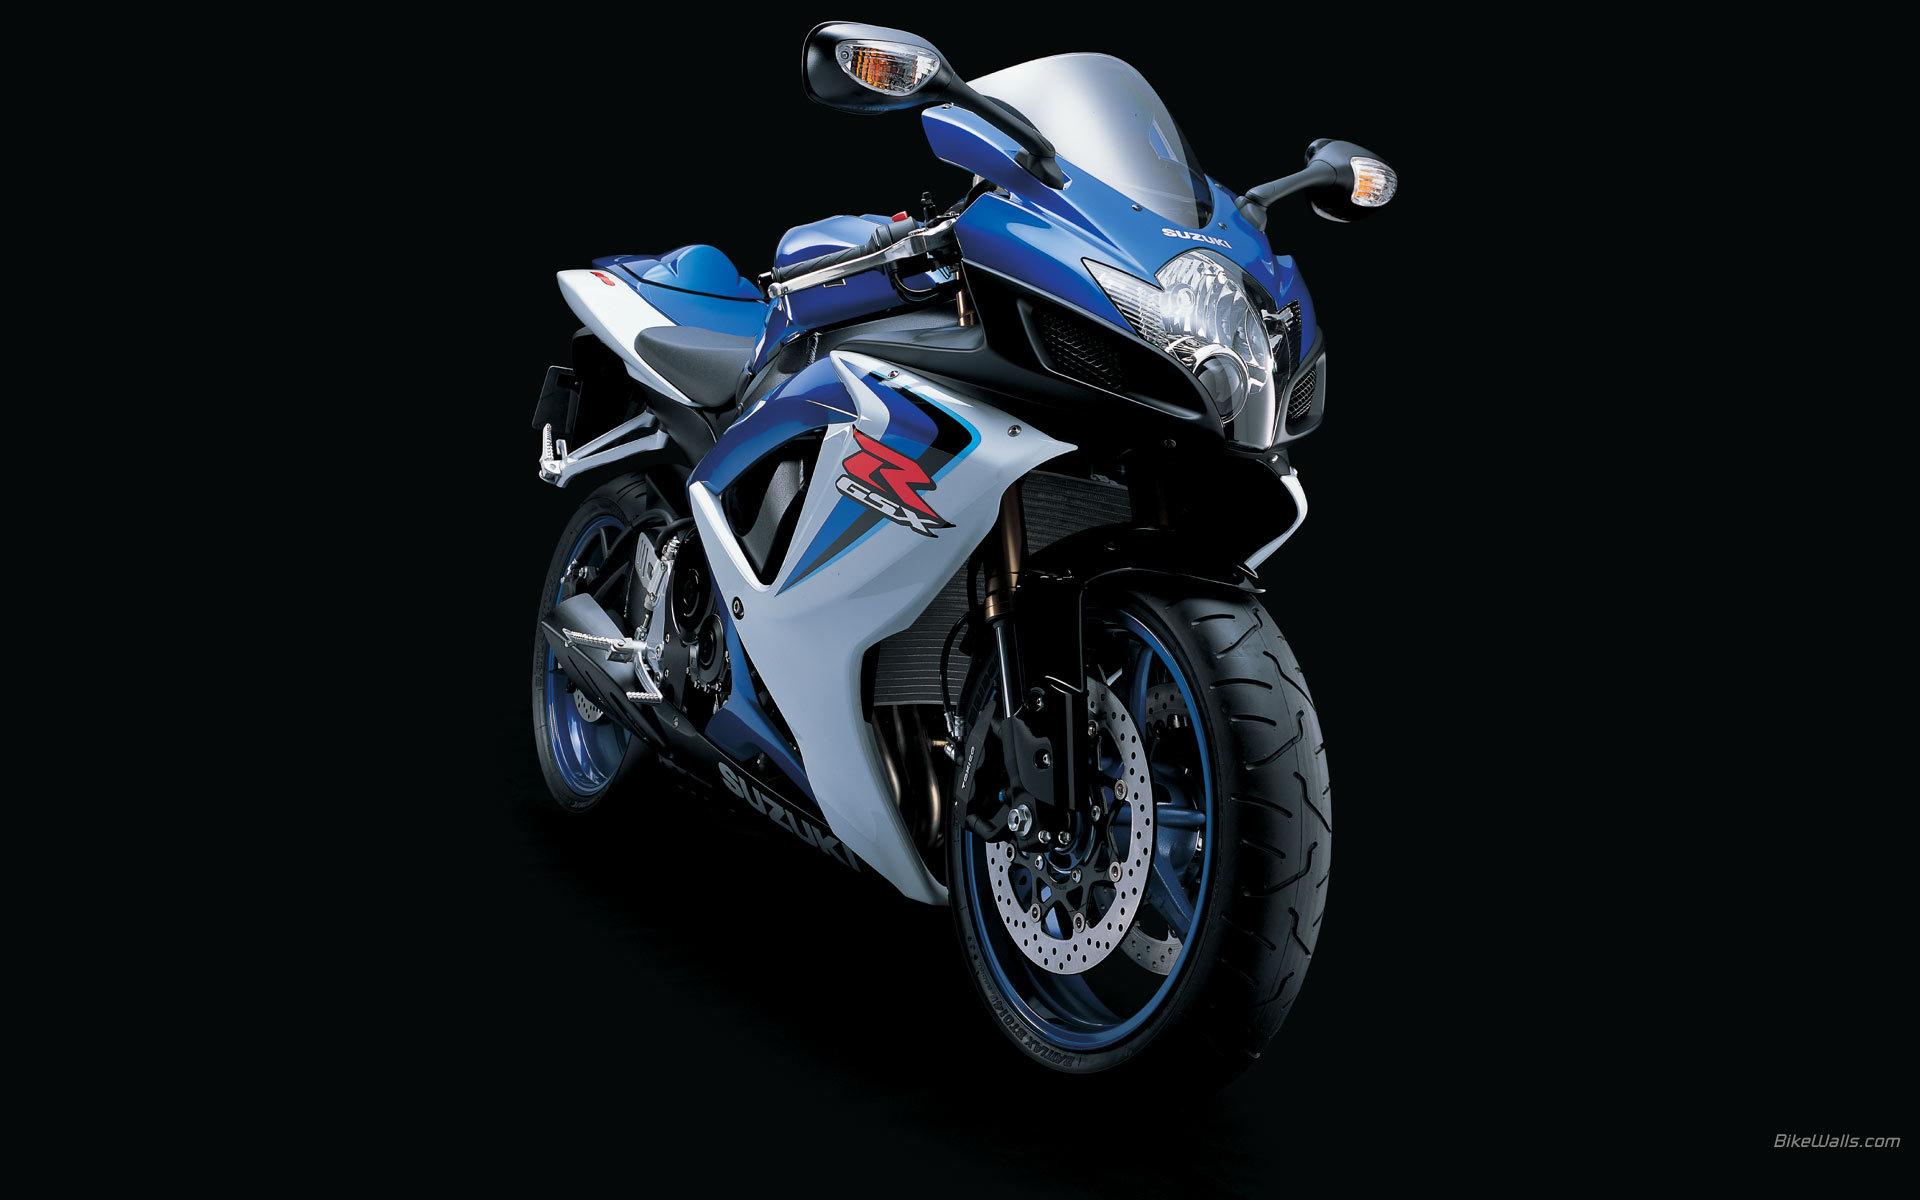 Картинки на телефон обои мотоциклы сузуки